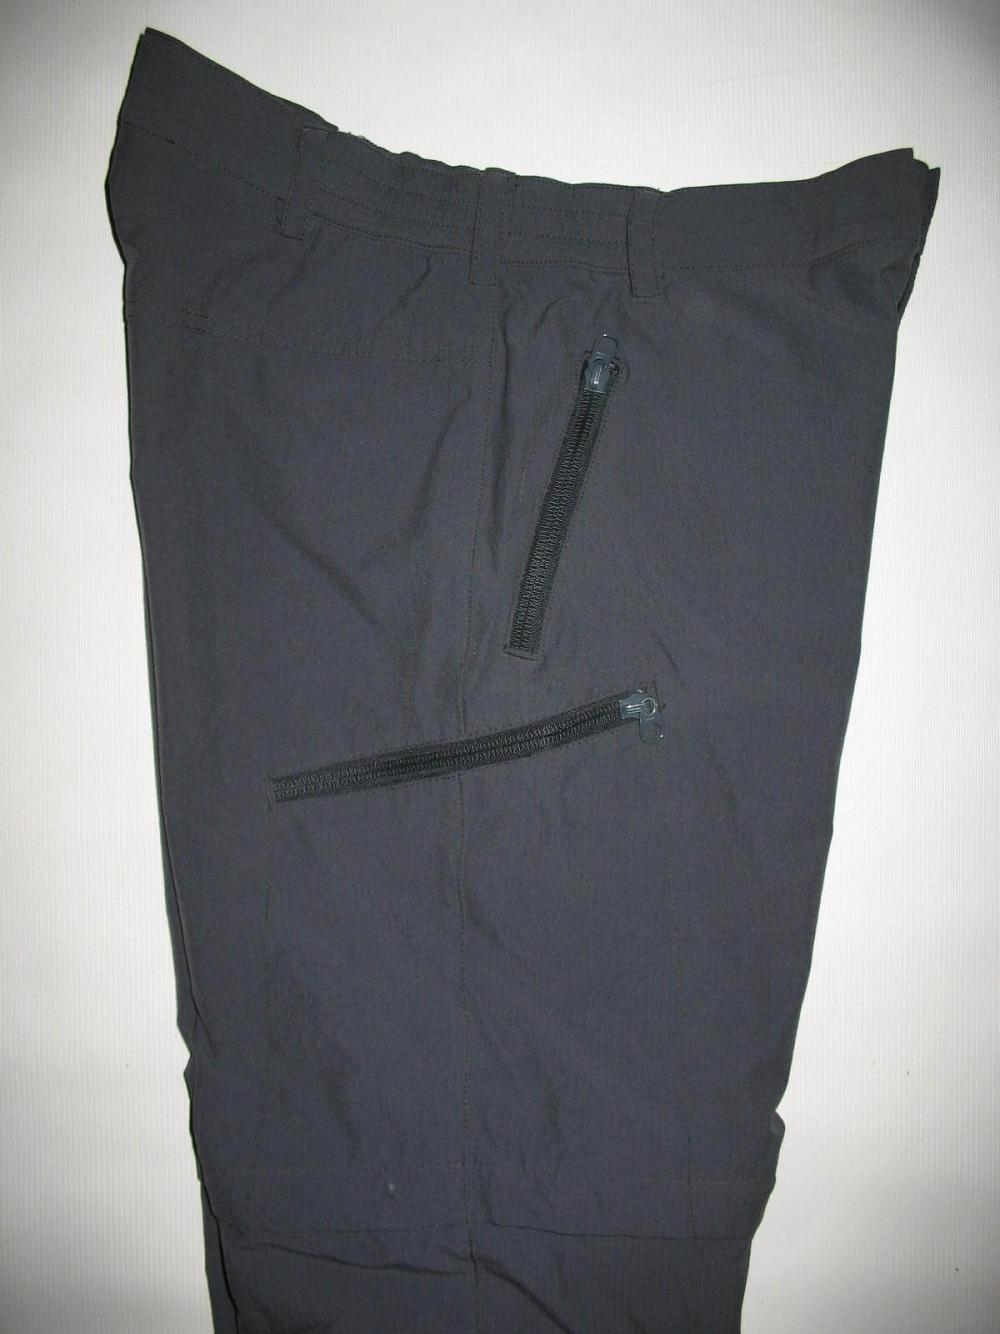 Штаны FJALLRAVEN 2in1 pants lady (размер 36/S) - 4